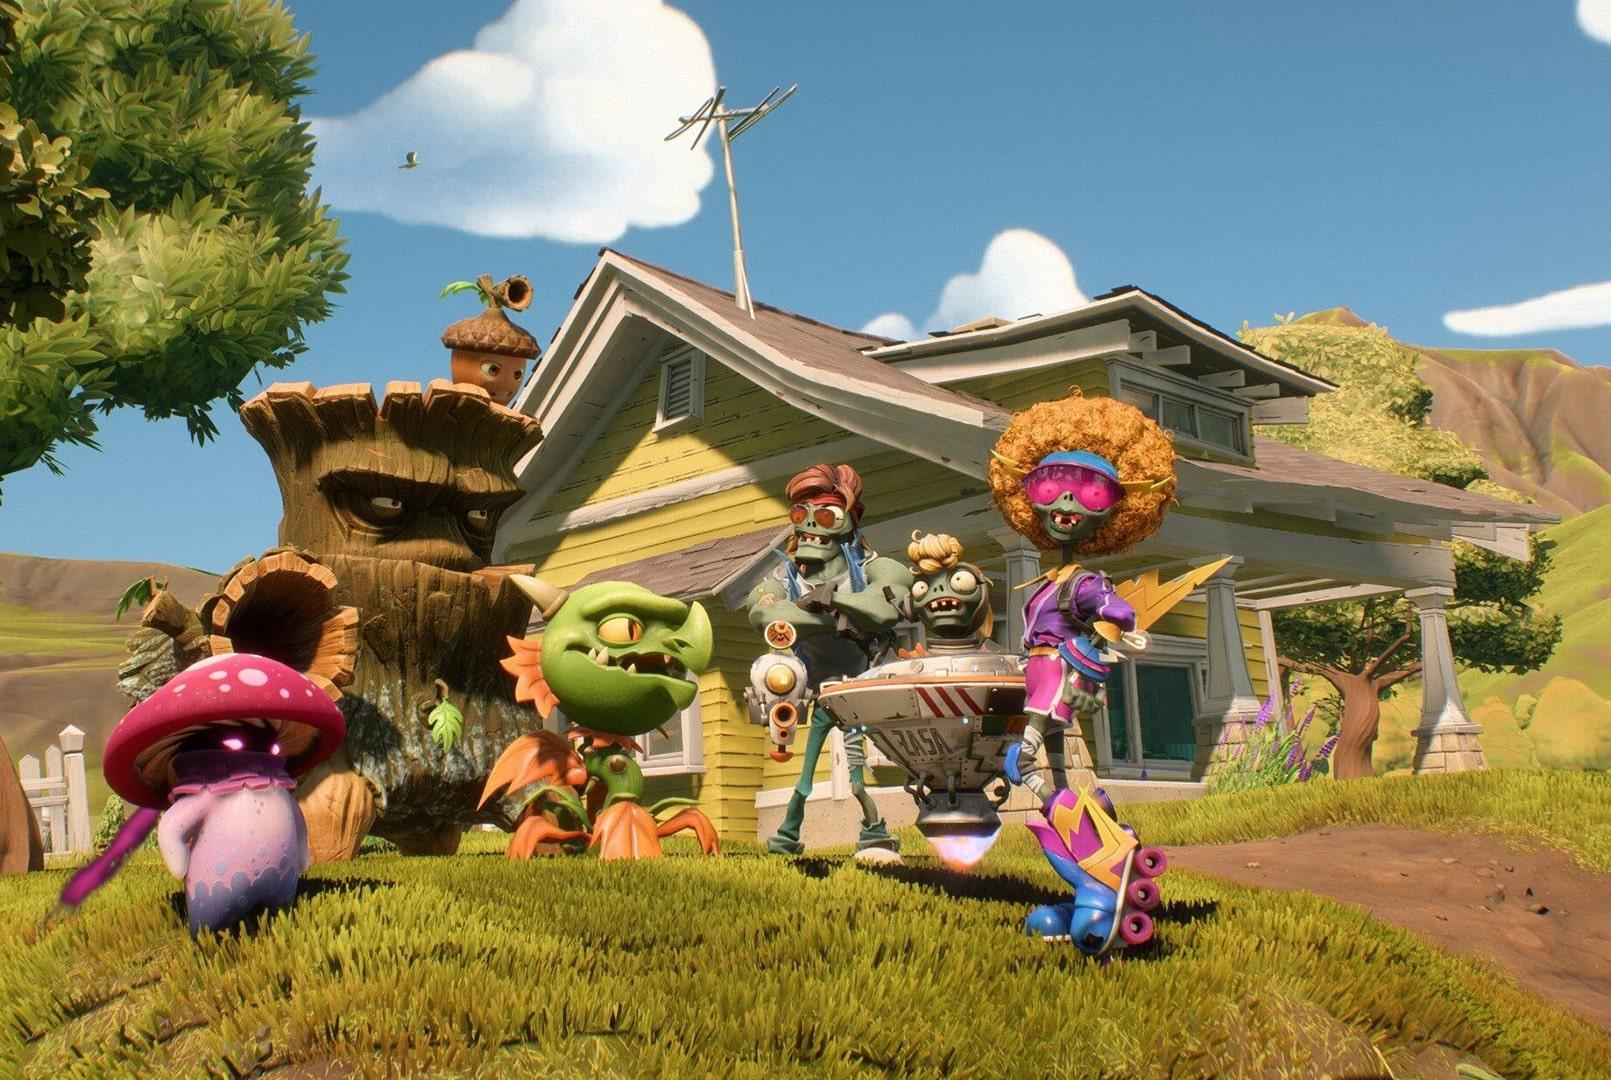 خرید سی دی کی Plants vs Zombies Battle for Neighborville اسکرین شات 2